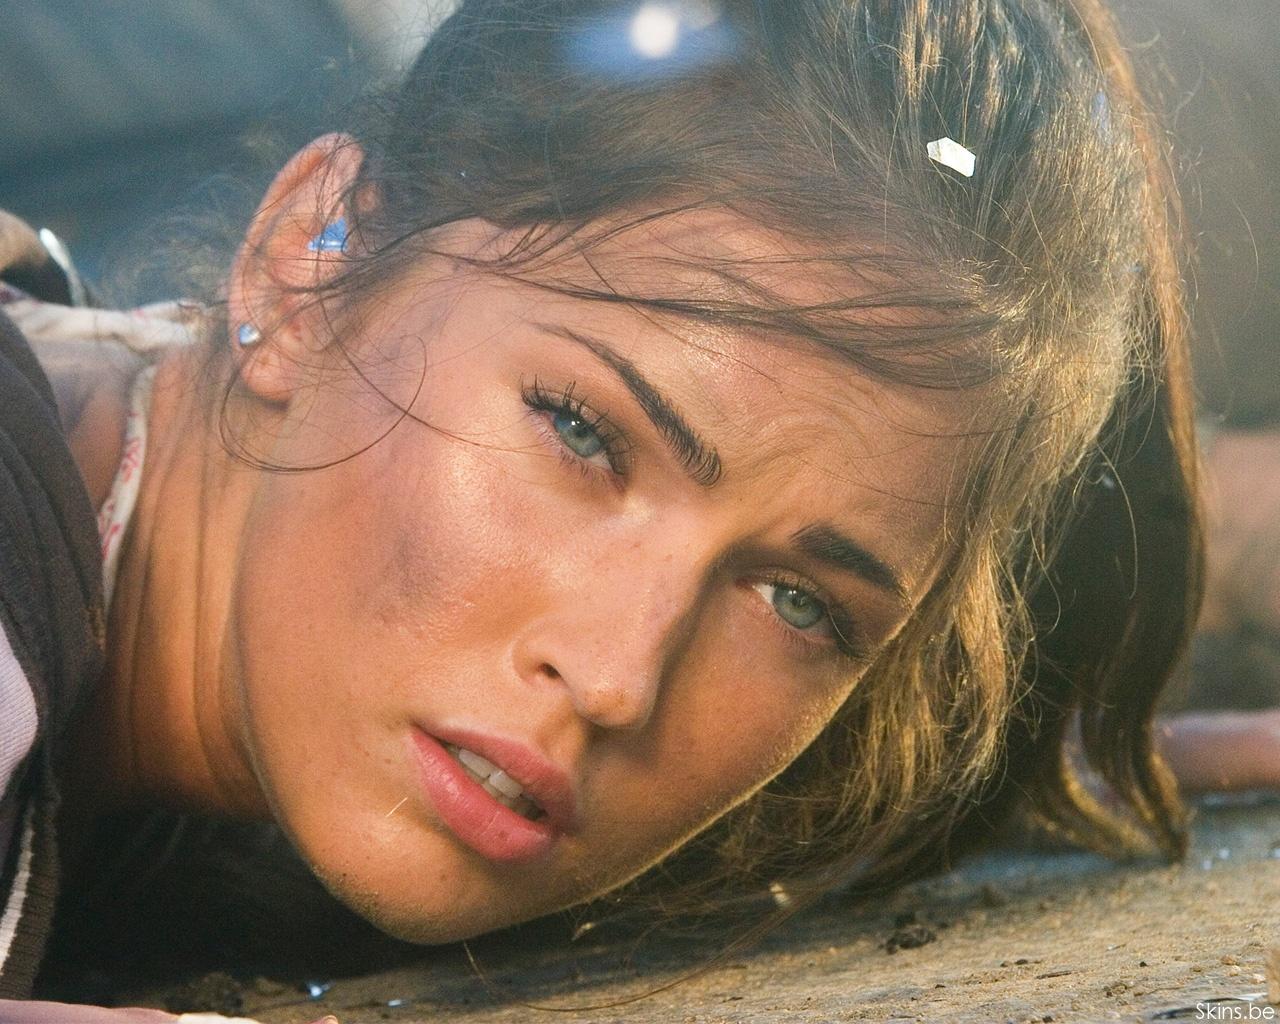 Megan Fox desktop wallpaper download in widescreen hd 30267 1280x1024